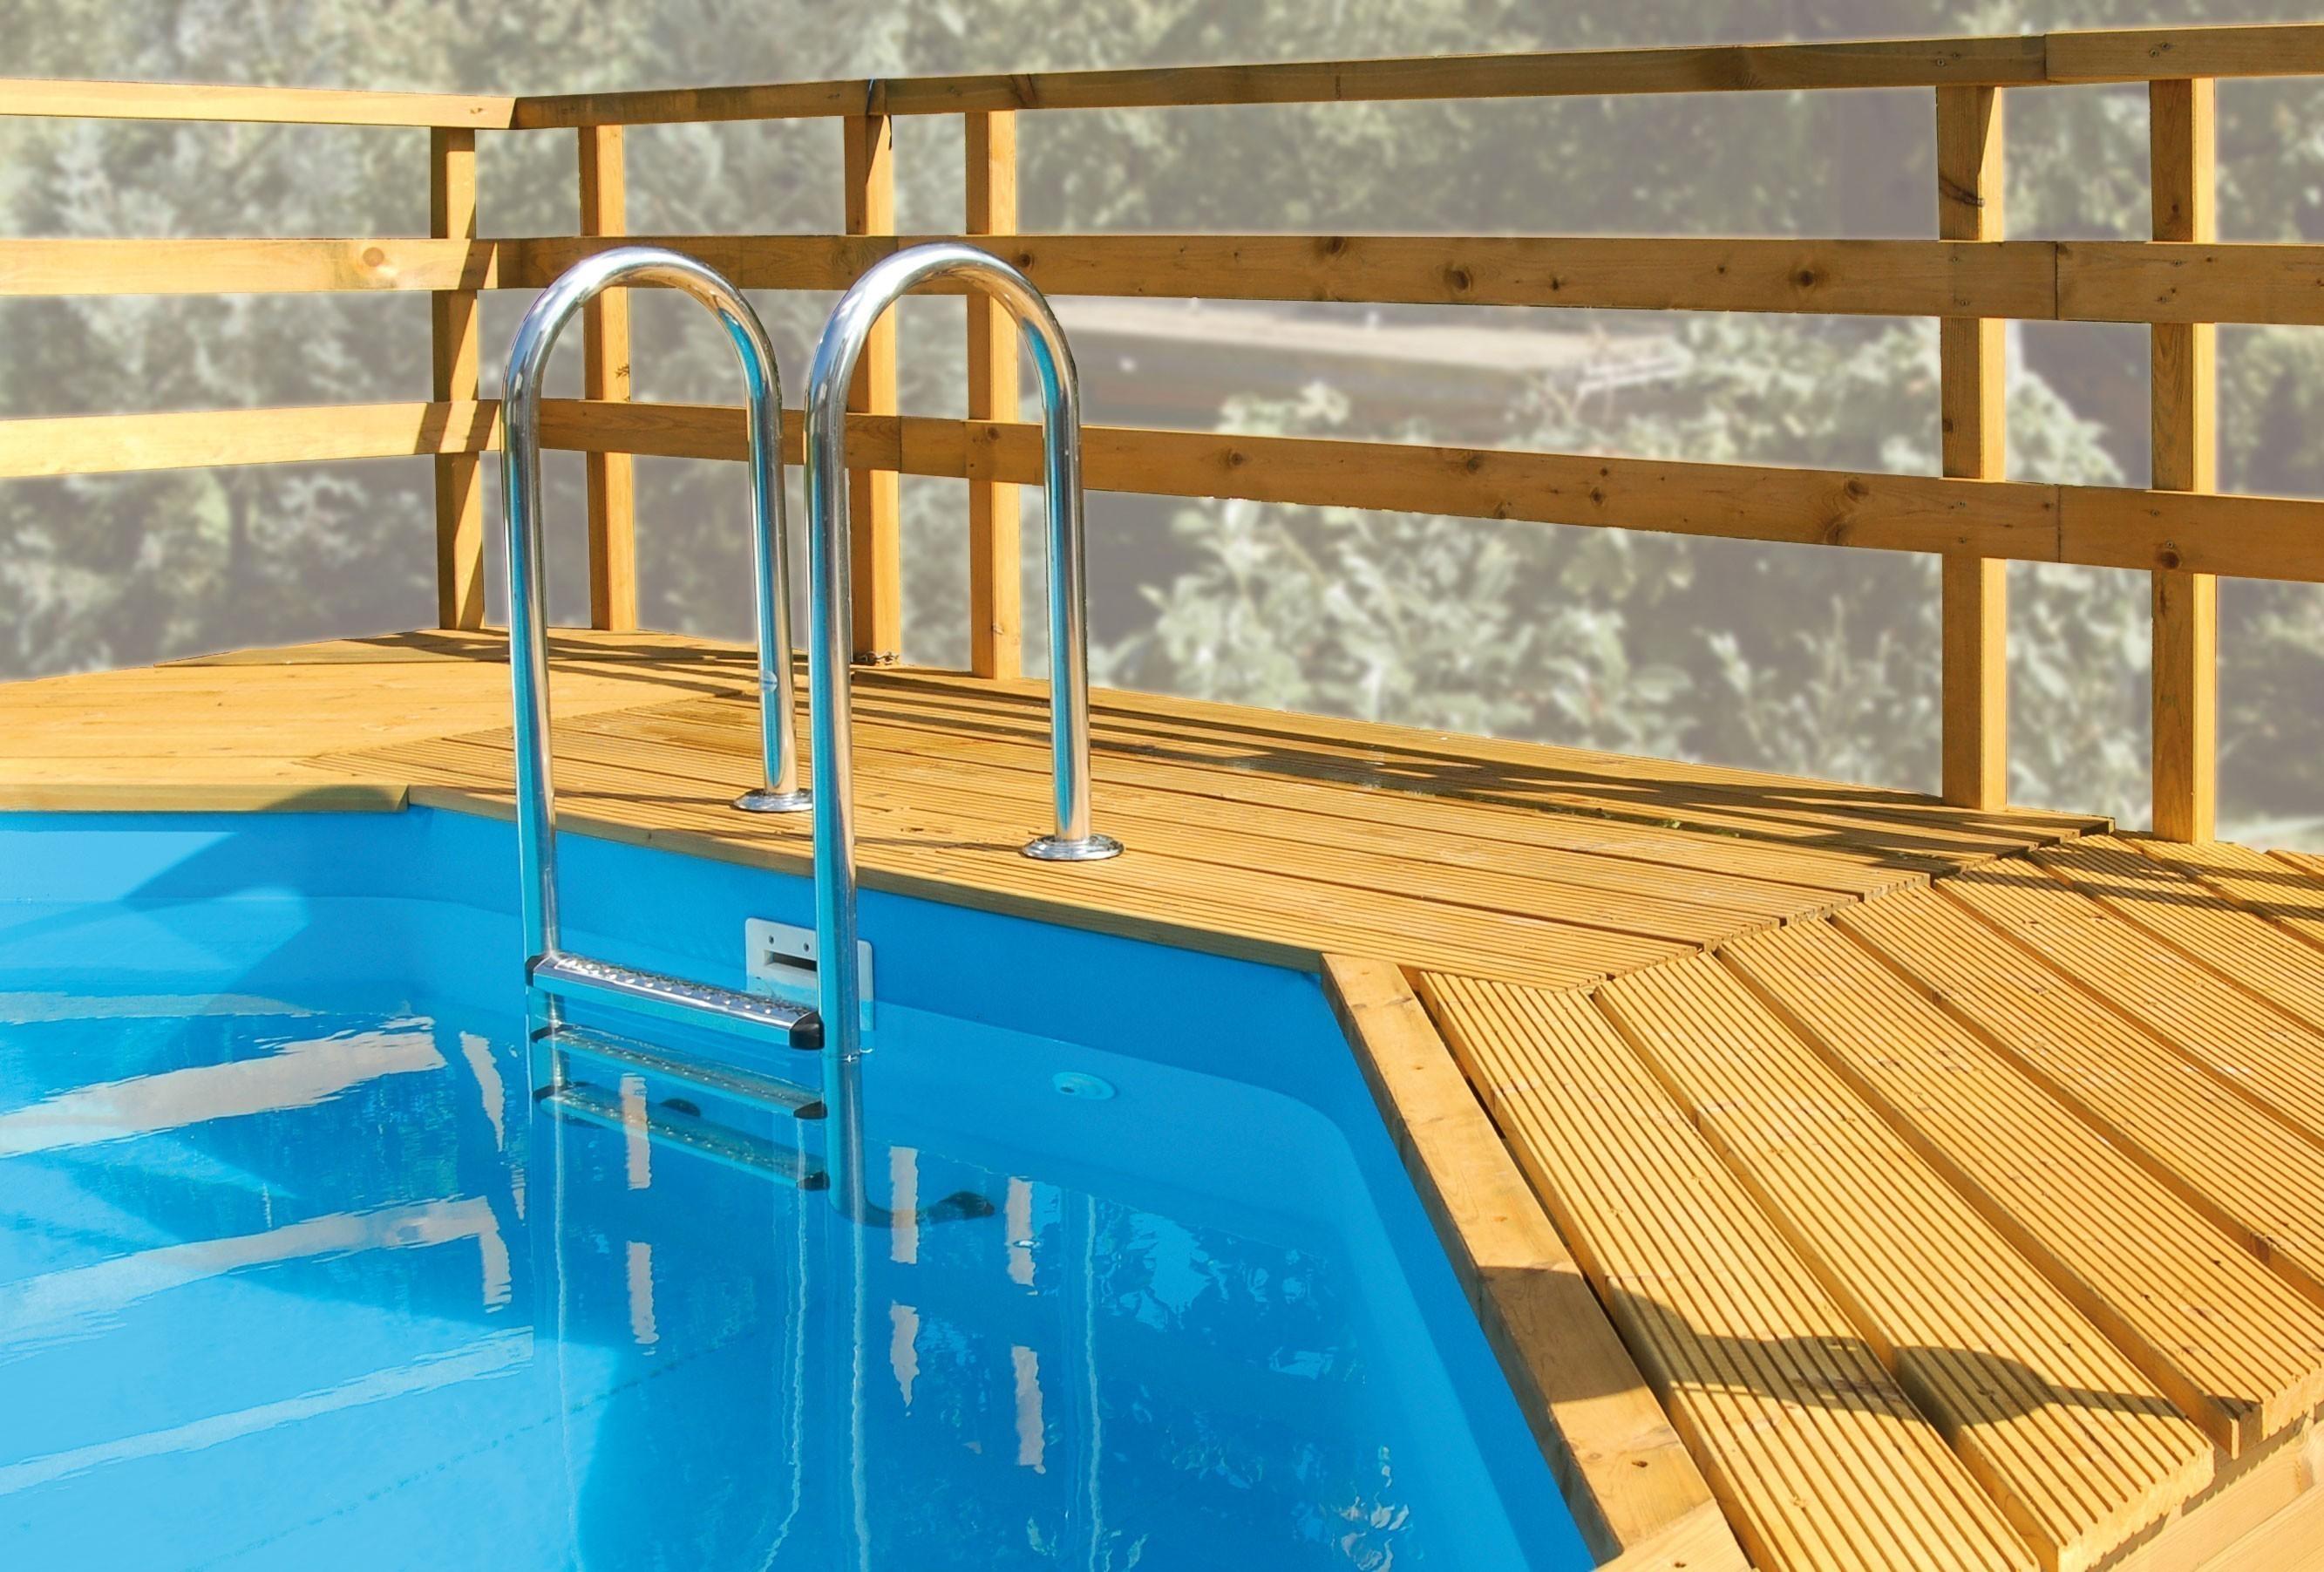 sonnendeck f r weka pool modell korsika korfu und malta. Black Bedroom Furniture Sets. Home Design Ideas